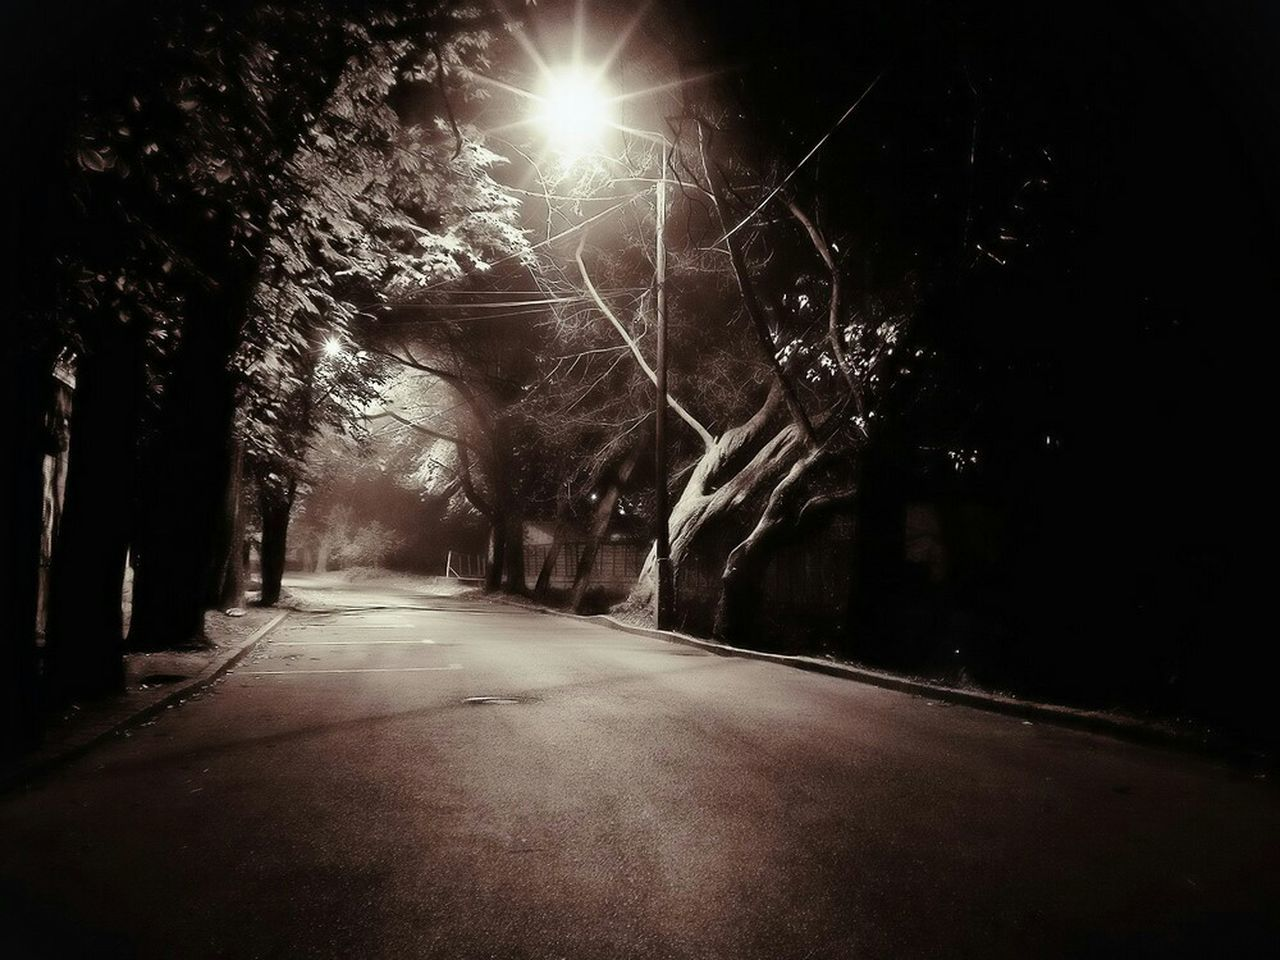 road, tree, the way forward, night, outdoors, no people, tranquility, nature, illuminated, sky